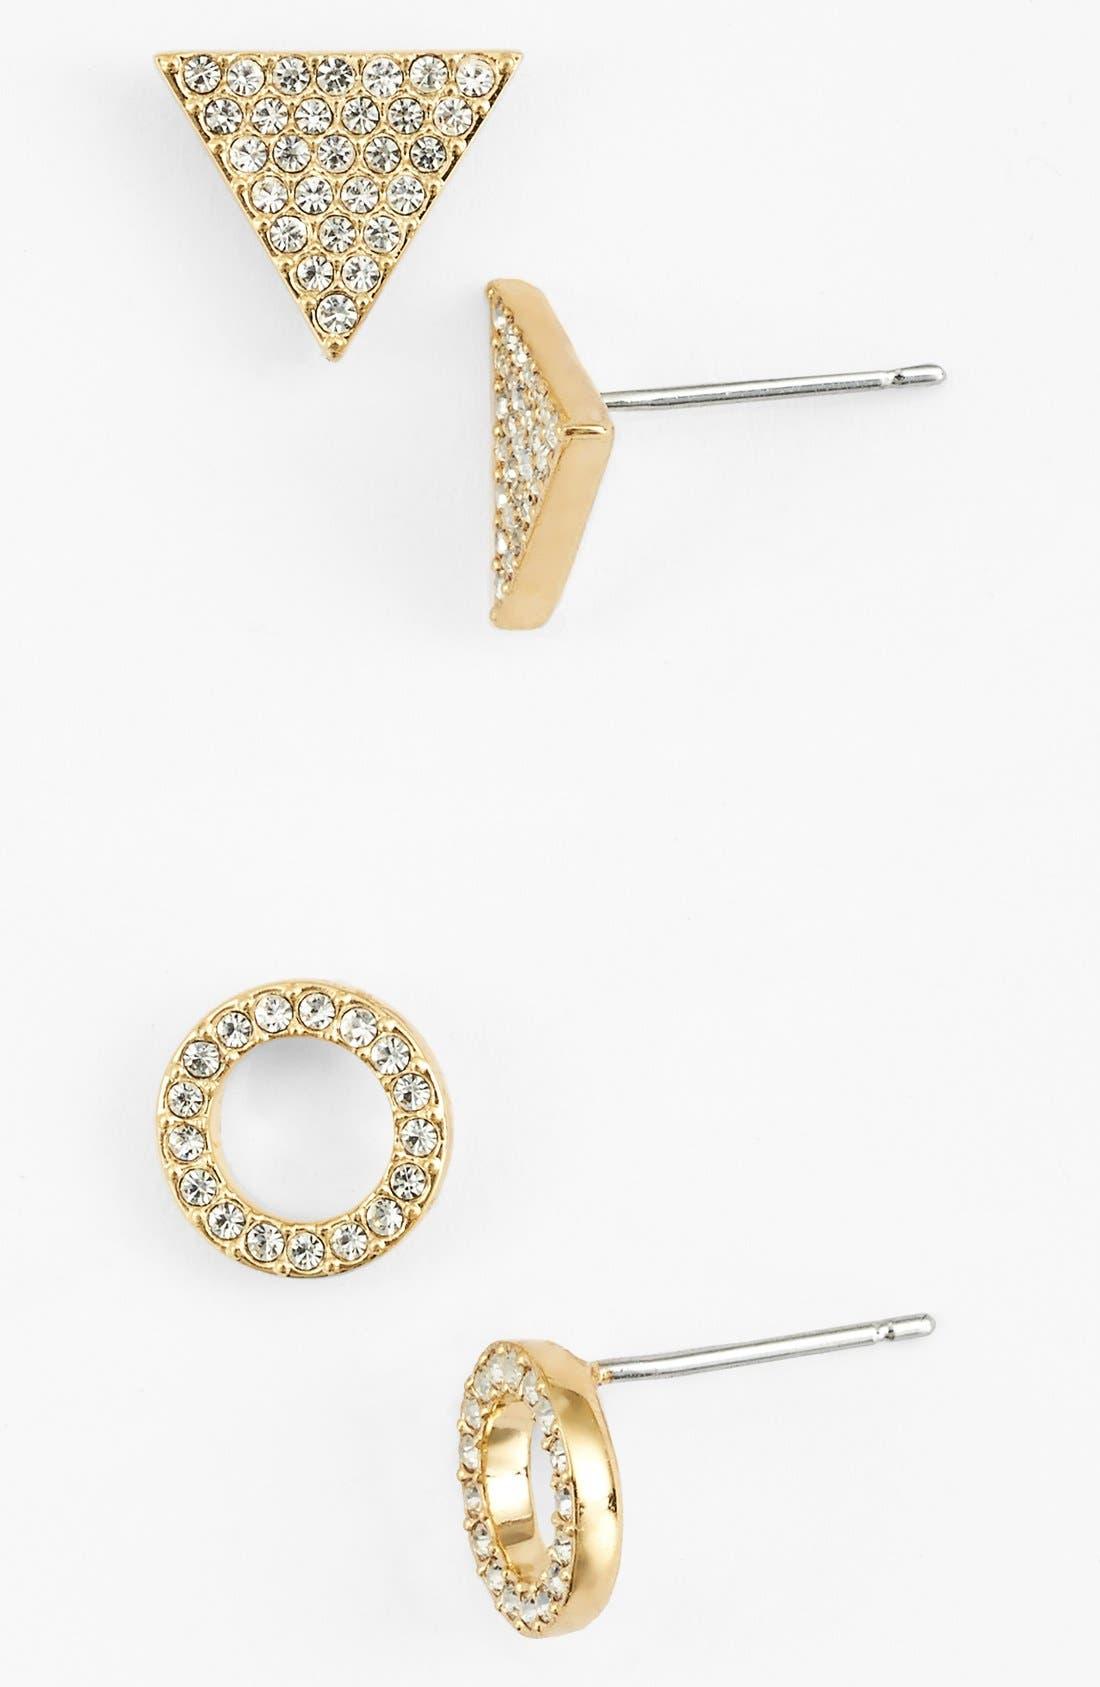 Alternate Image 1 Selected - Nadri Pavé Stud Earrings (Set of 2)